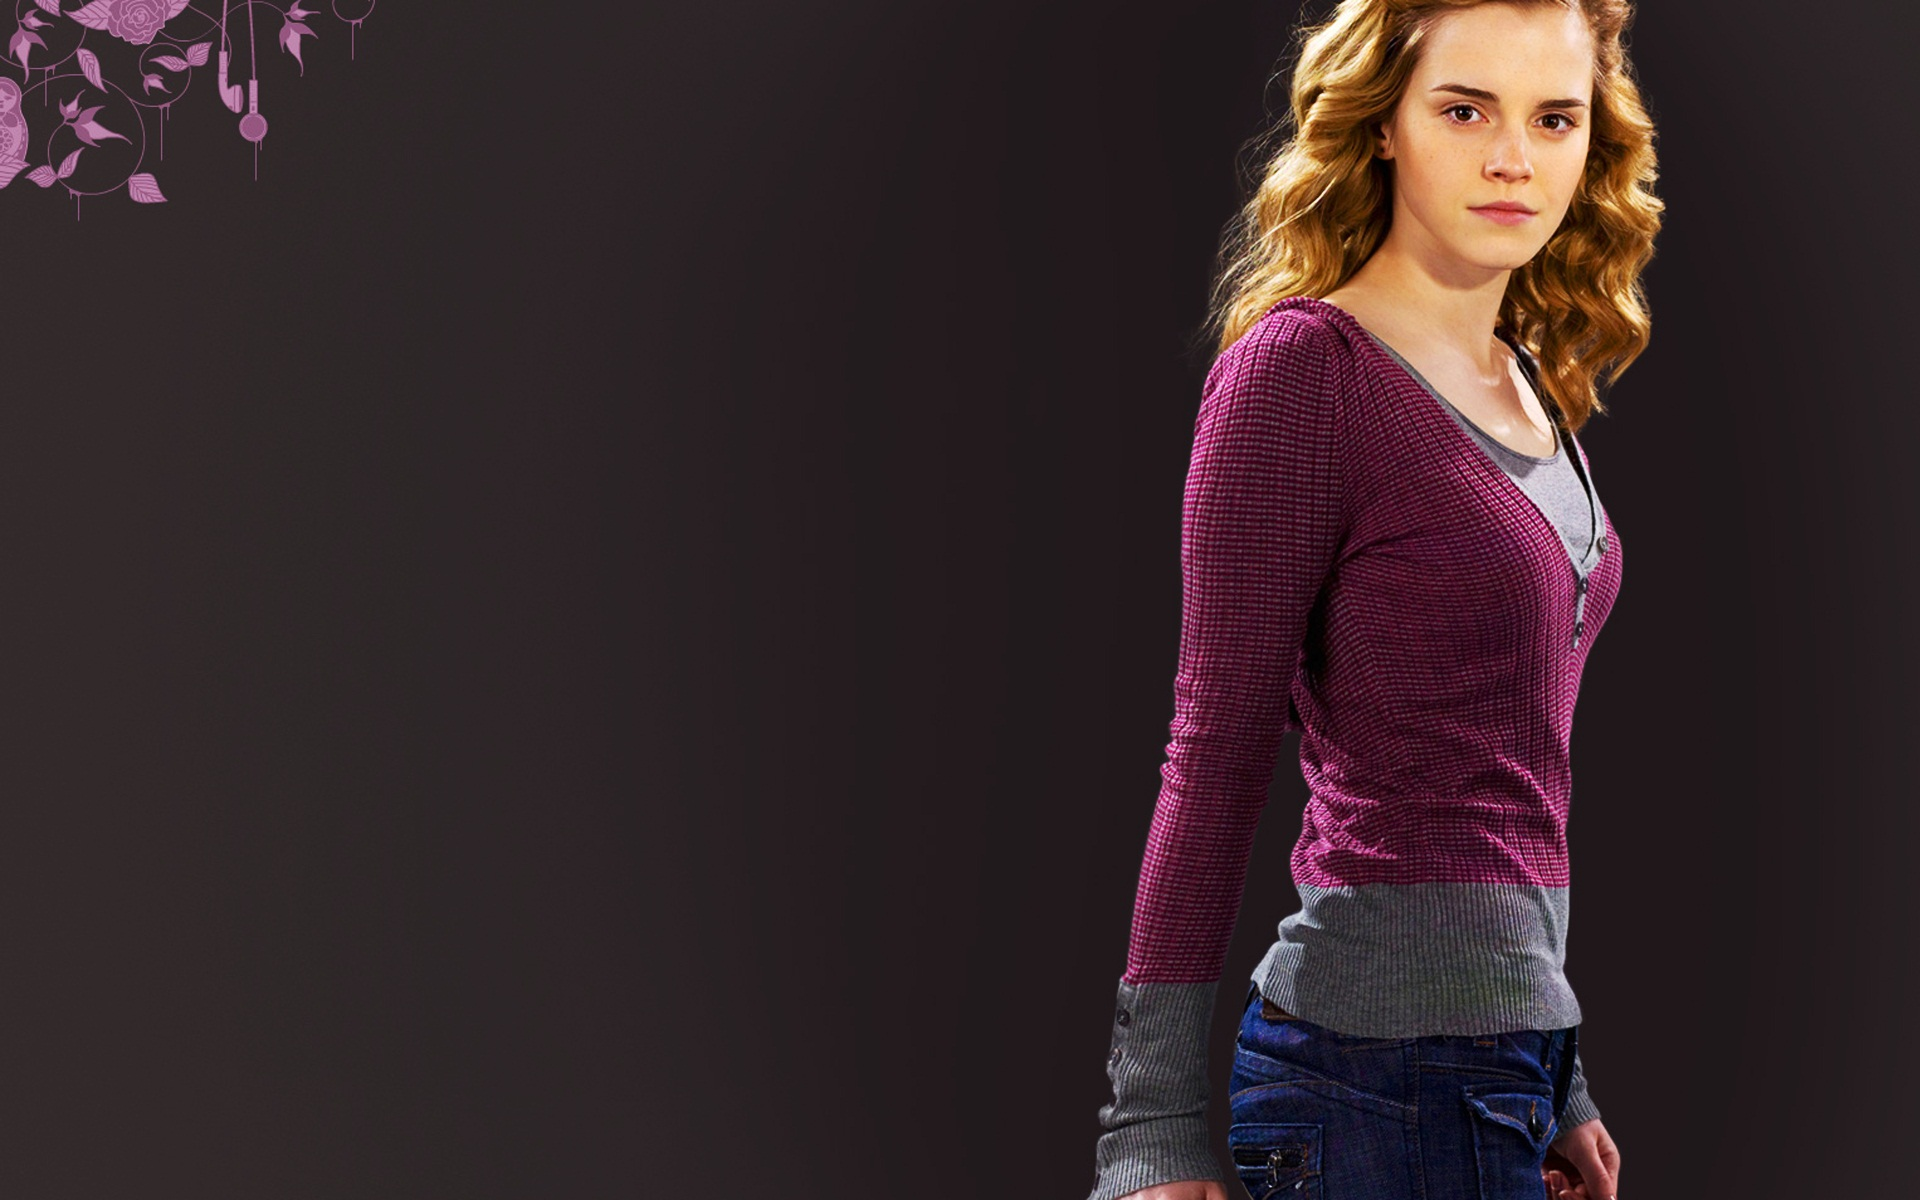 Emma Watson 264 wallpaper